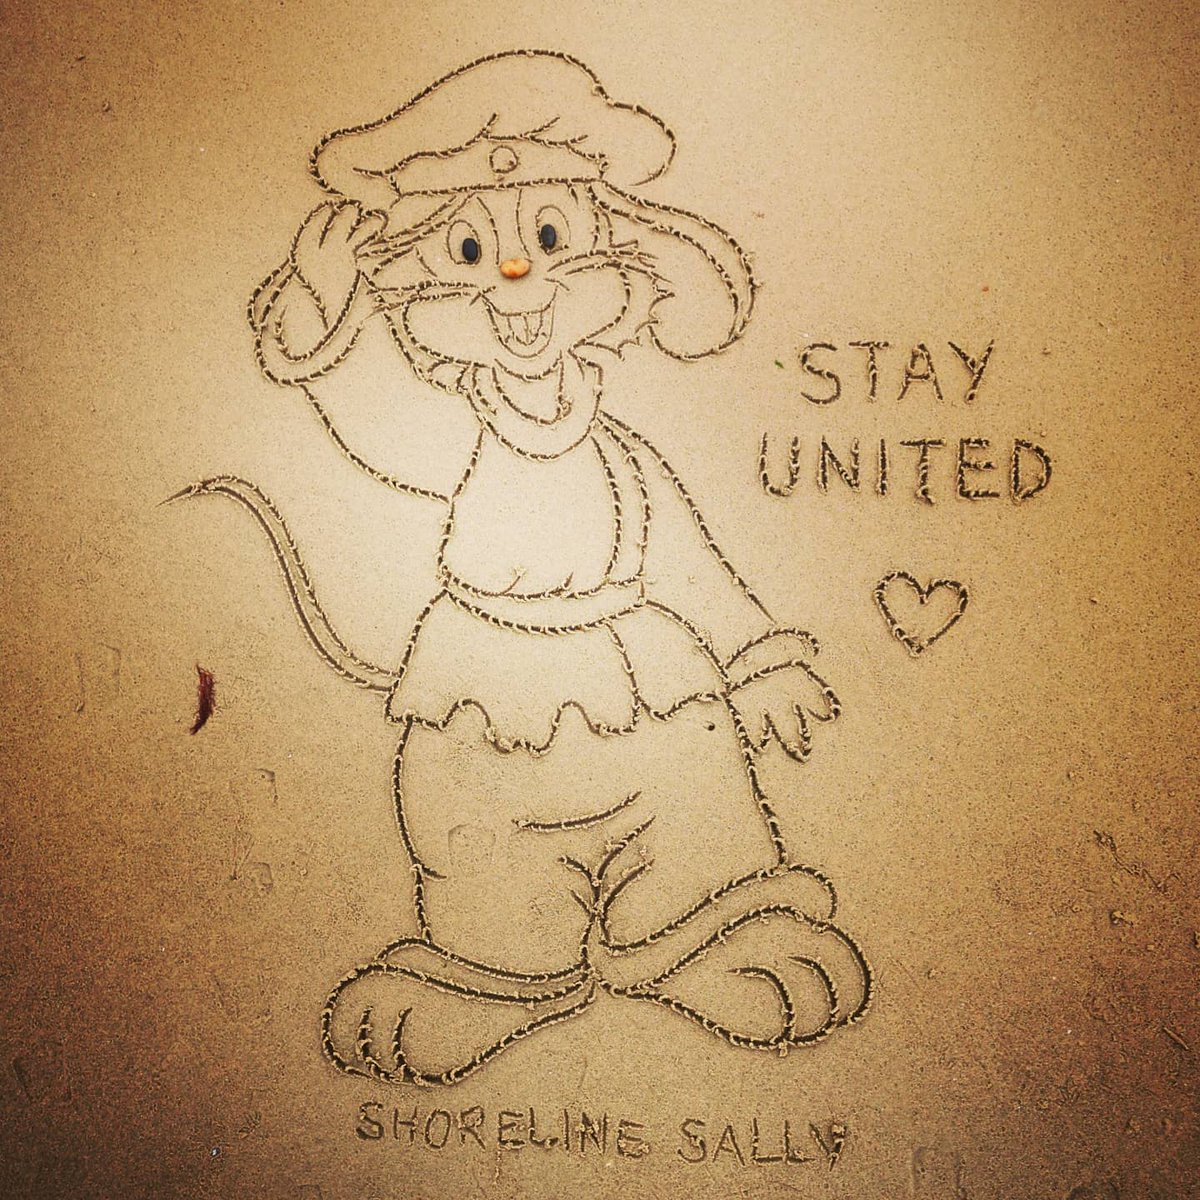 Stay United 🐭 #Fievel #FievelMousekewitz #AnAmericanTale #Reunited 💛 #StaySafe #sanddrawing #beachart 🌊🌊🌊 #Lockdown2020 #comics #cartoons ✍️ #SandBanksy #ShorelineSally https://t.co/m7qymv66ZD